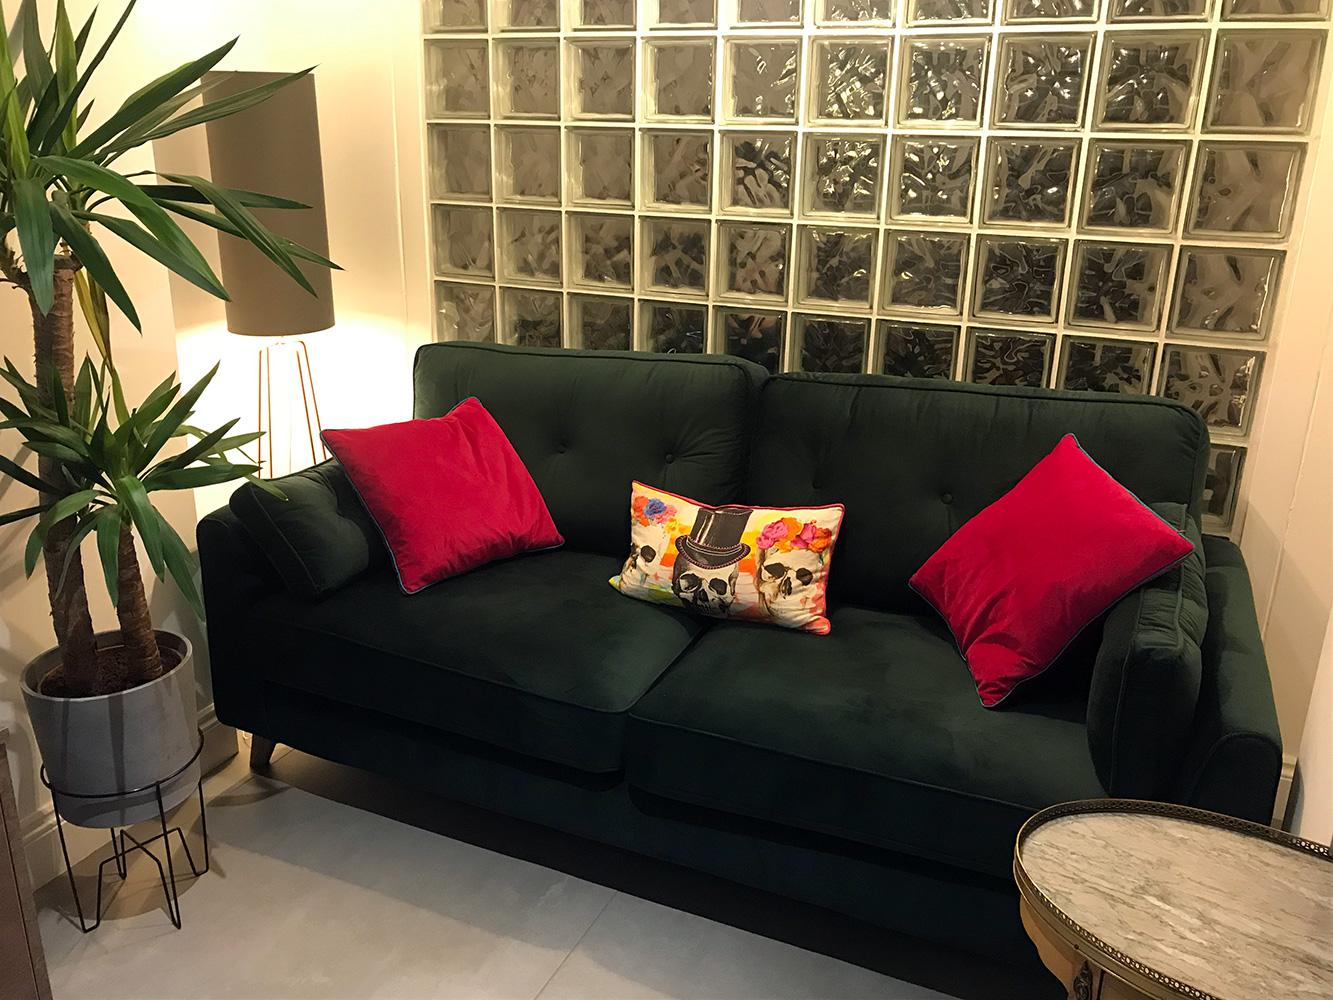 Grünes Magnus-Sofa von Kevin